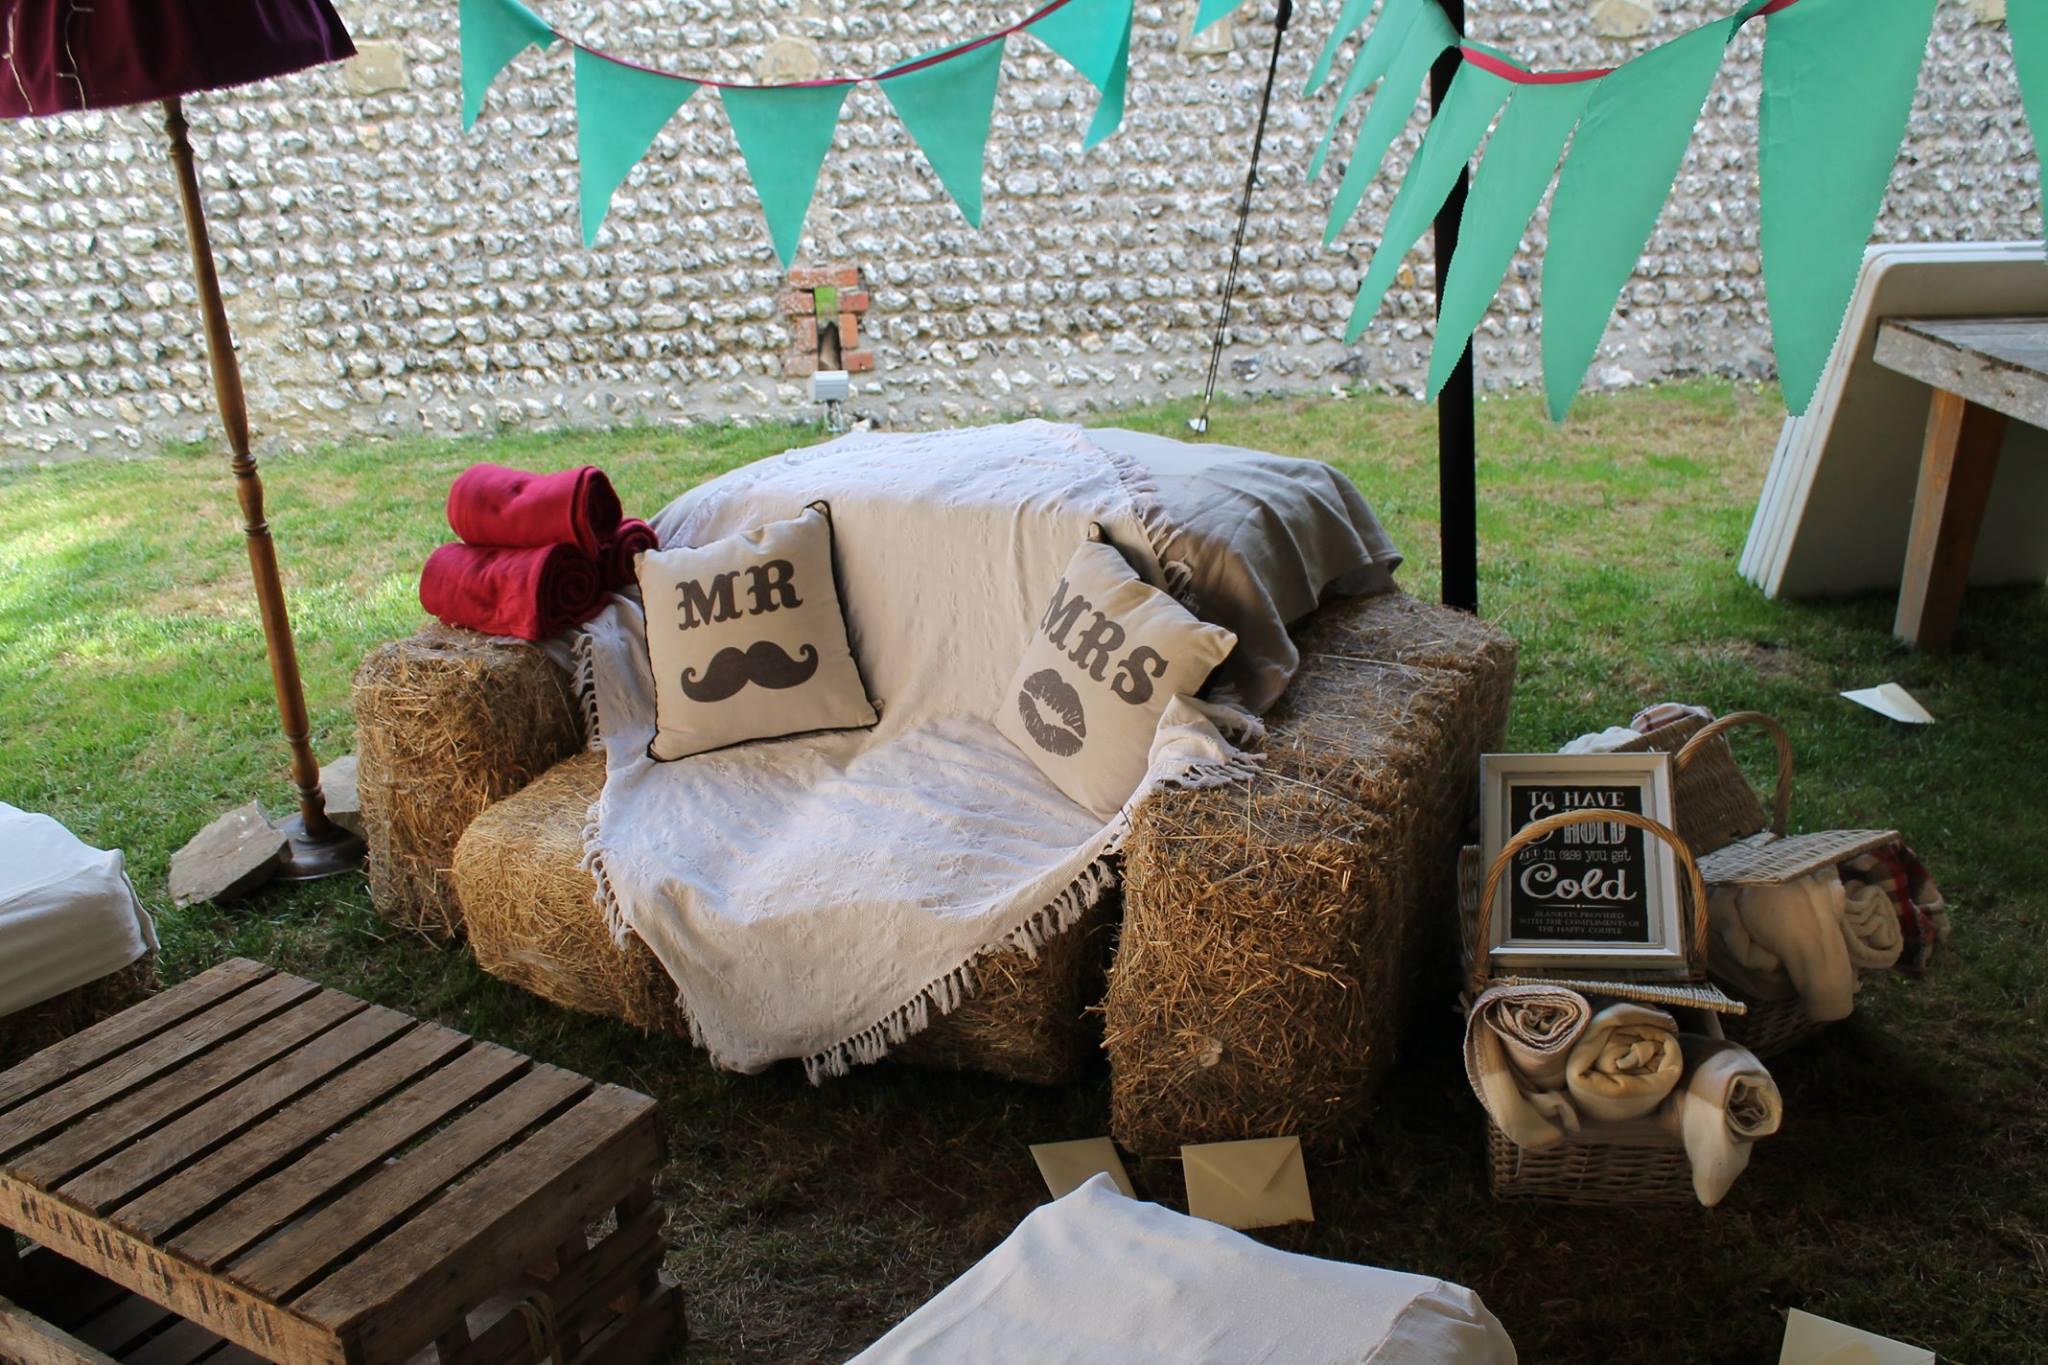 hay bale sofa and blankets.jpg